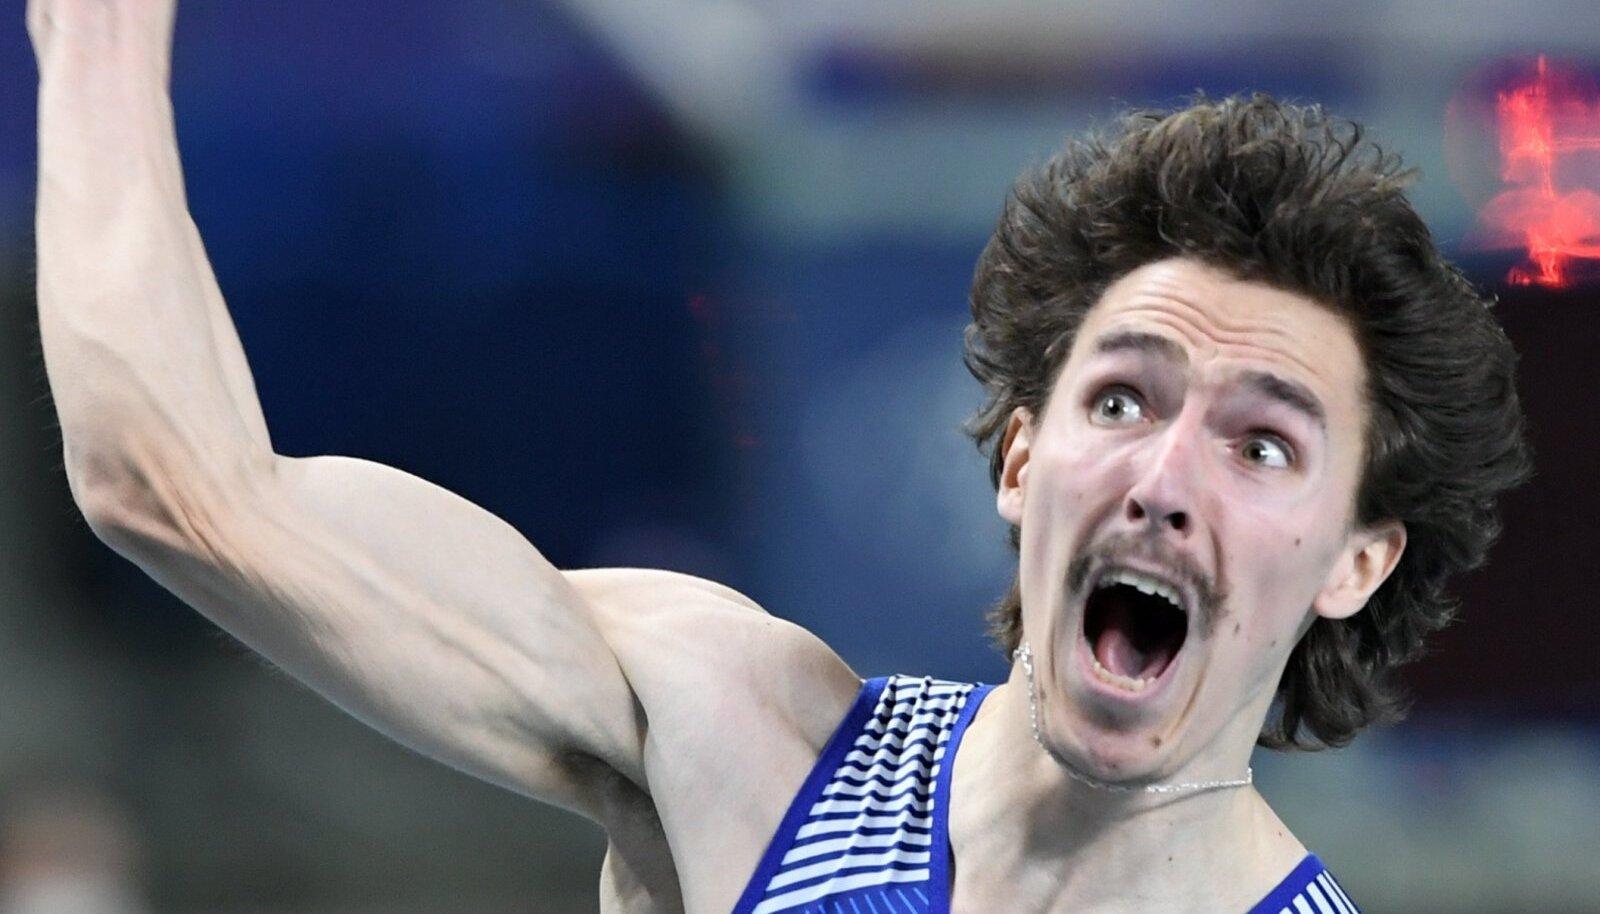 2021 European Athletics Indoor Championships in Torun